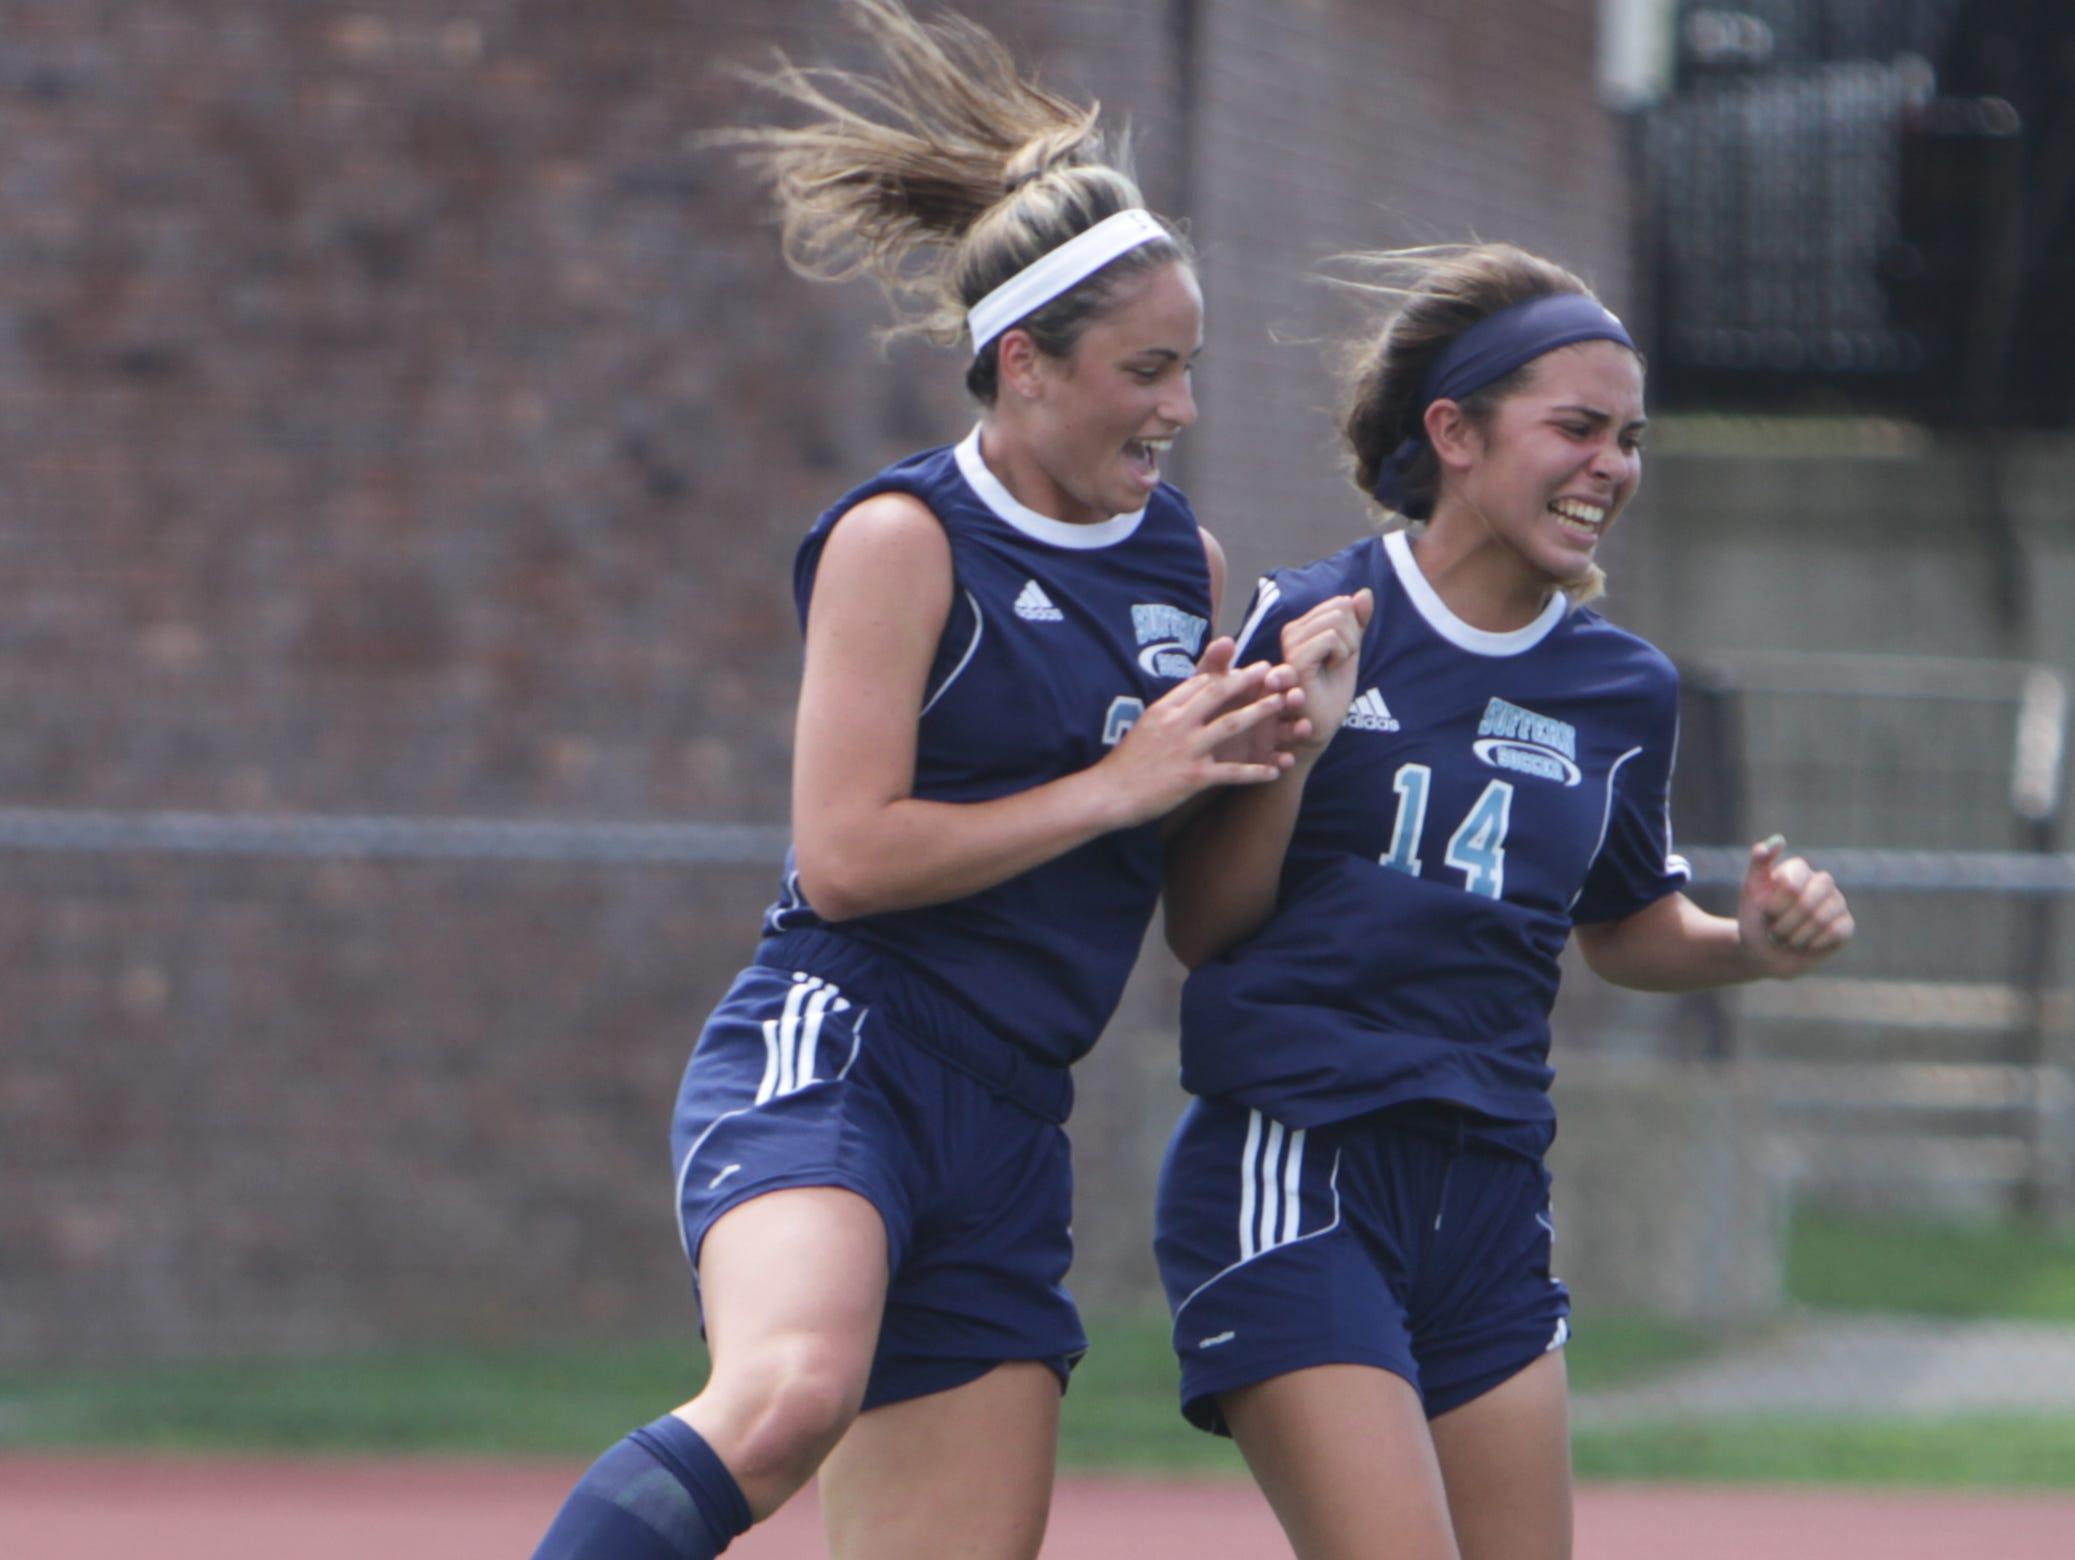 Suffern's Kyra Greenbaum (left) and Tatiana Cruz celebrate after Greenbaum's first half goal during a Section 1 girls soccer game between New Rochelle and Suffern at New Rochelle High School Friday, Sept. 2. Suffern won 4-1.